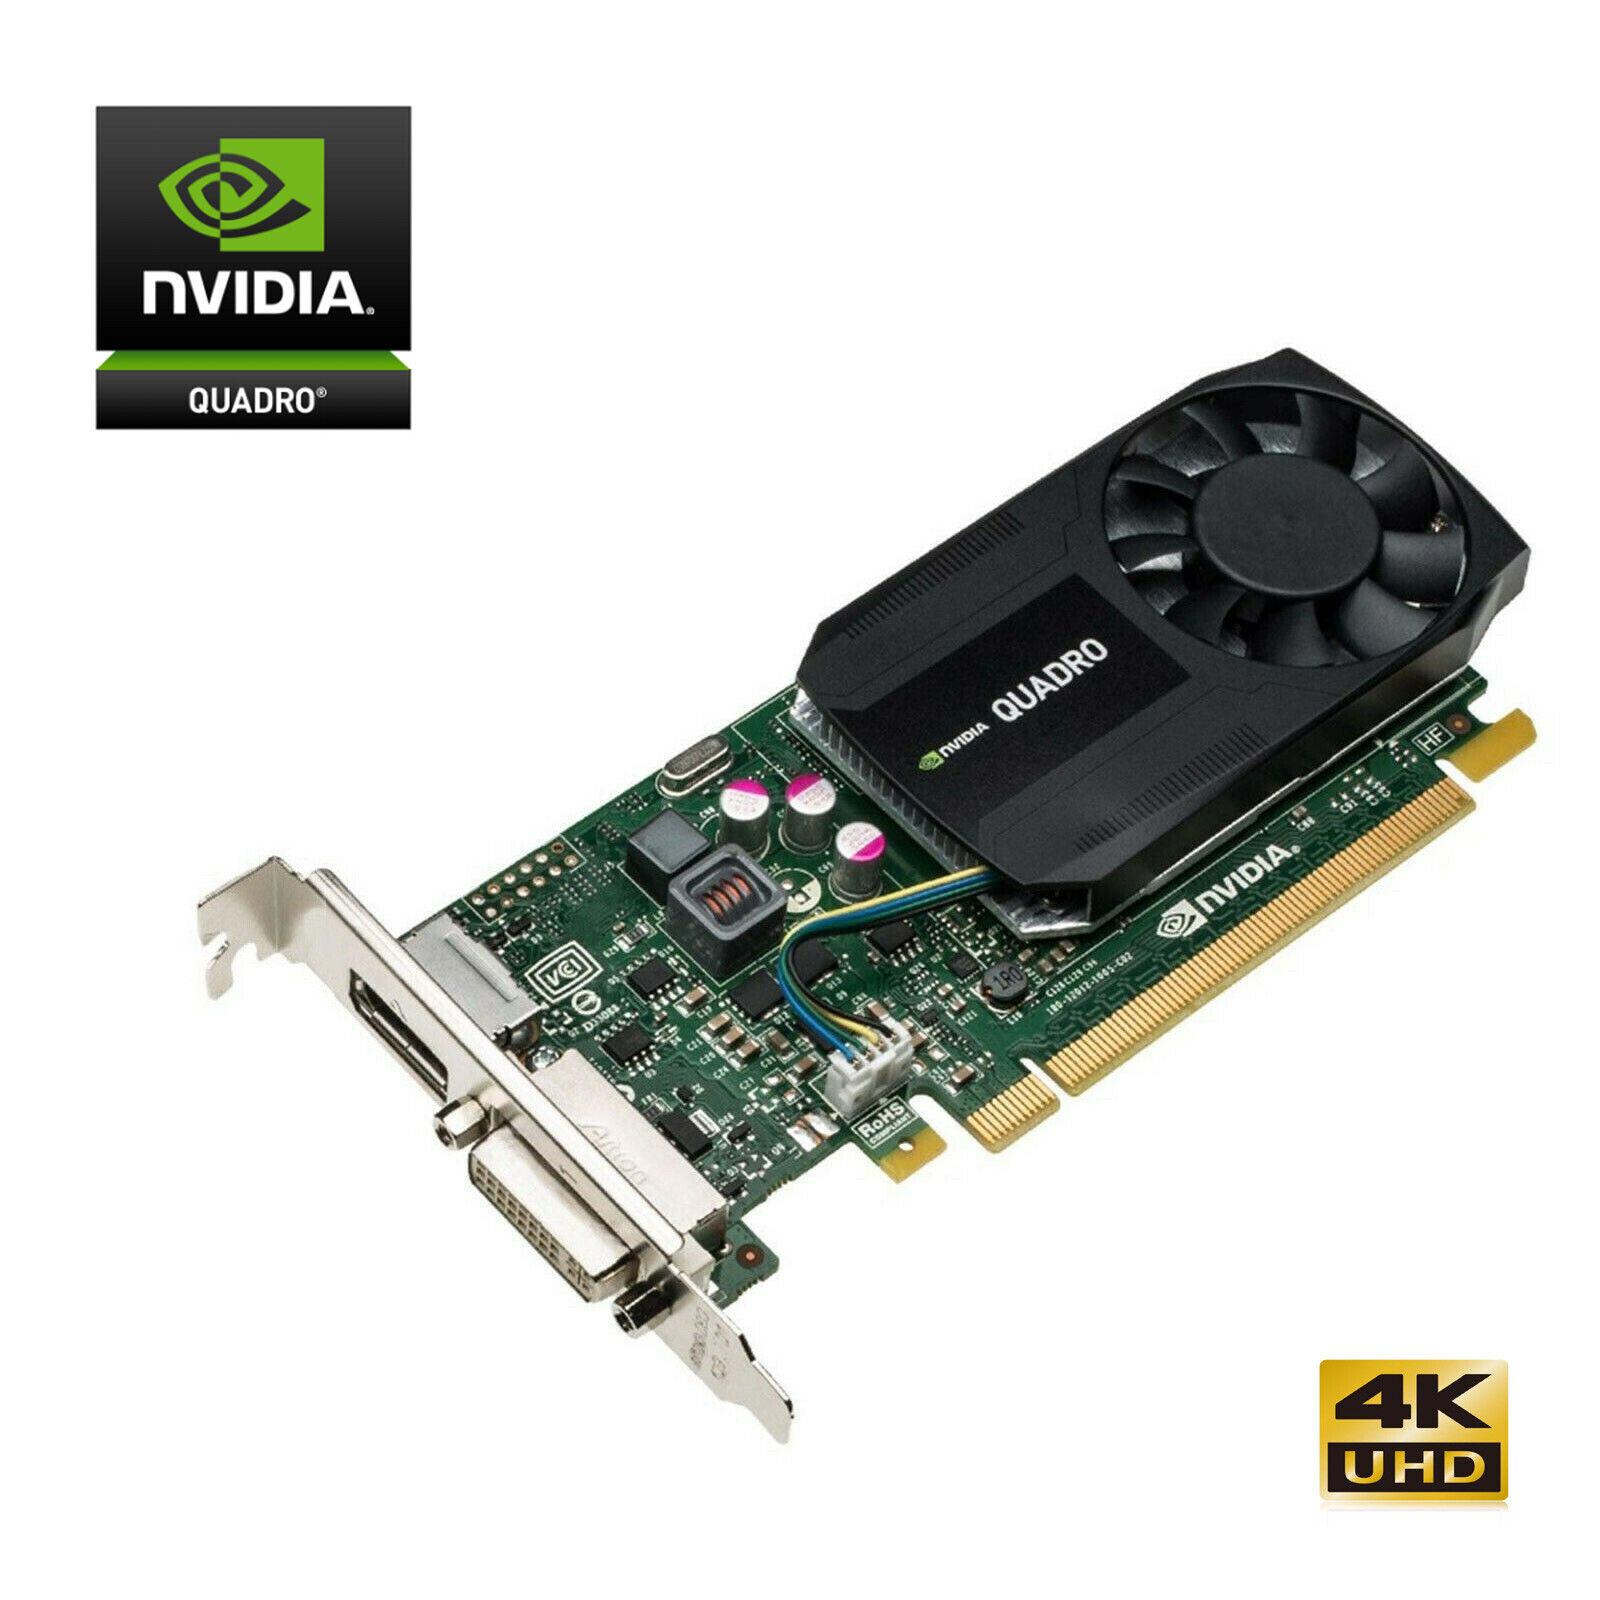 Nvidia Quadro K620 SFF 2GB PCI-E DP DVI 4K UHD Grafikkarte, HDMI-Adap., Gewährl.